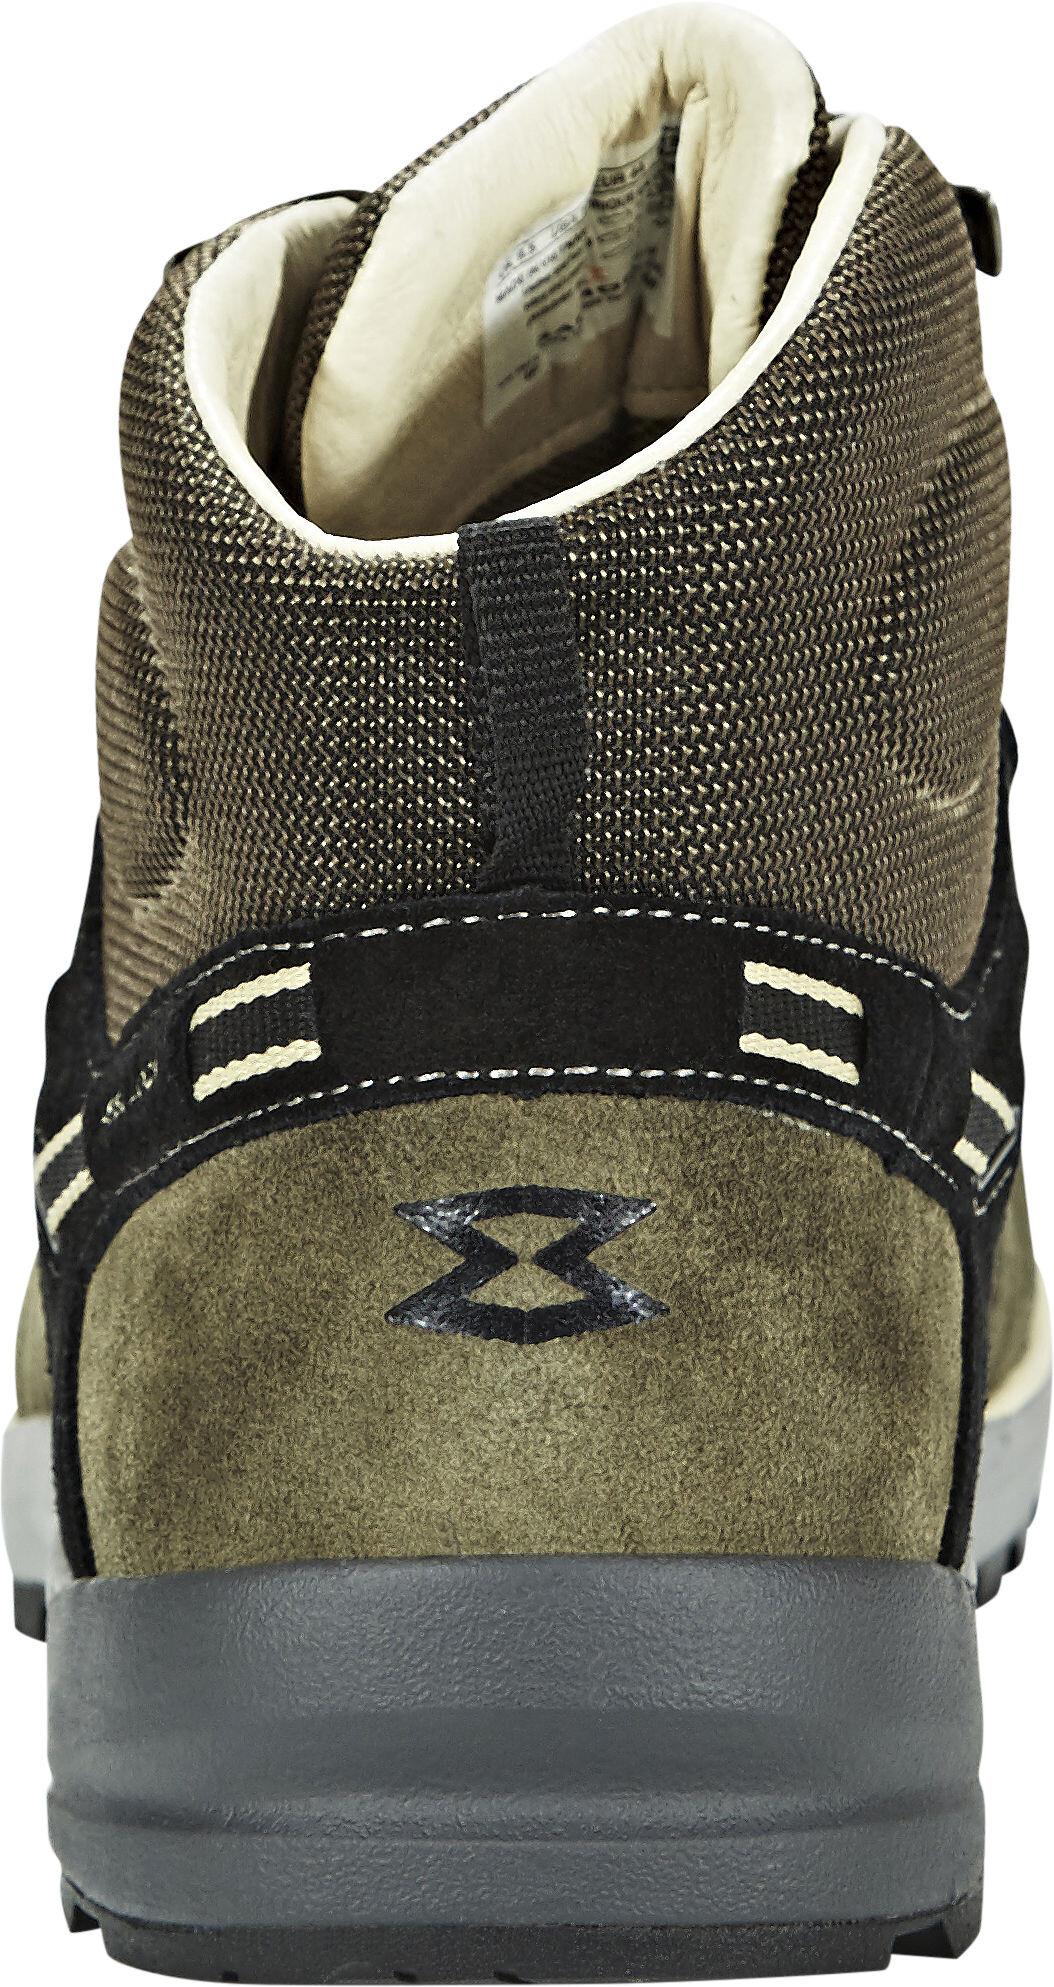 Garmont Santiago GTX - Chaussures Homme - beige olive sur CAMPZ ! 4210773383c6